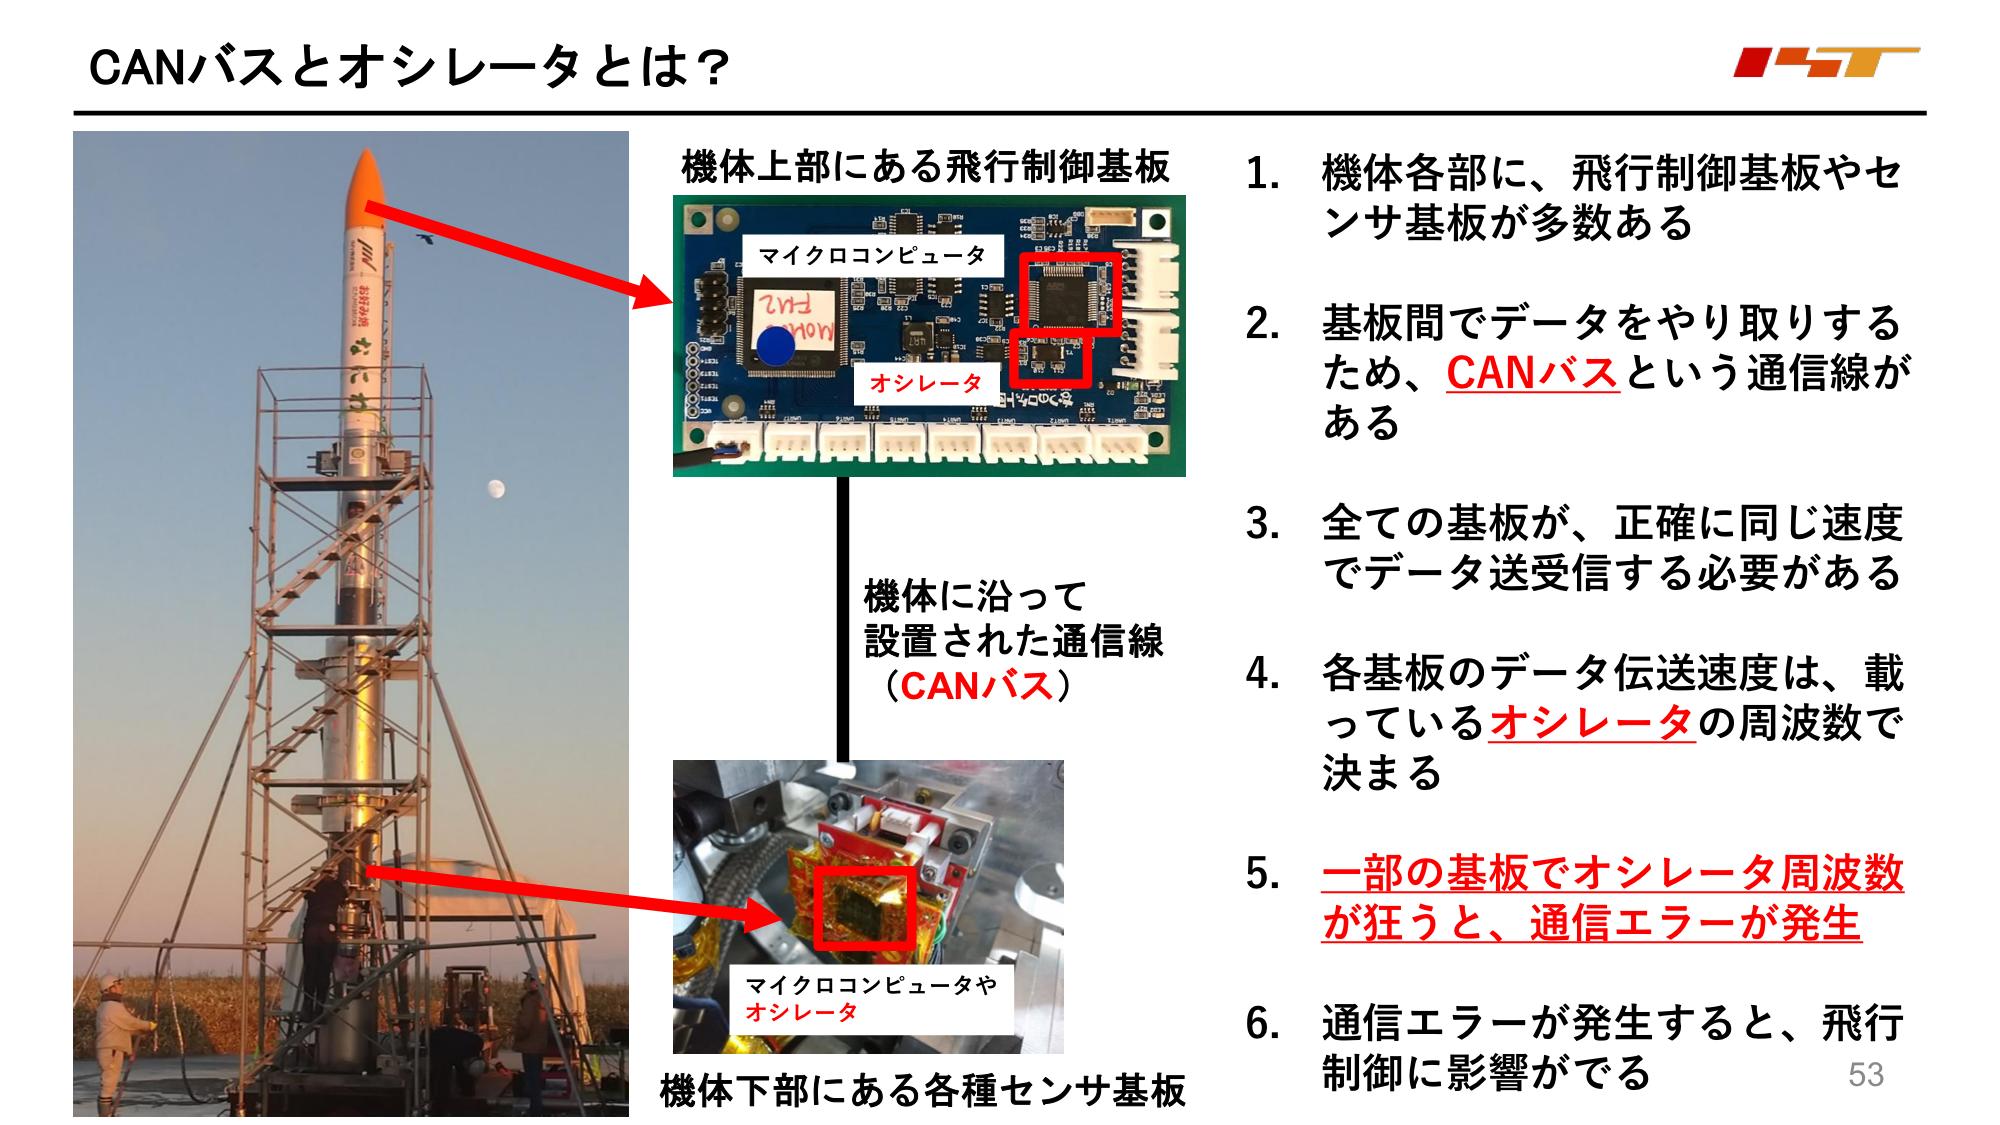 f:id:Imamura:20200603233301p:plain